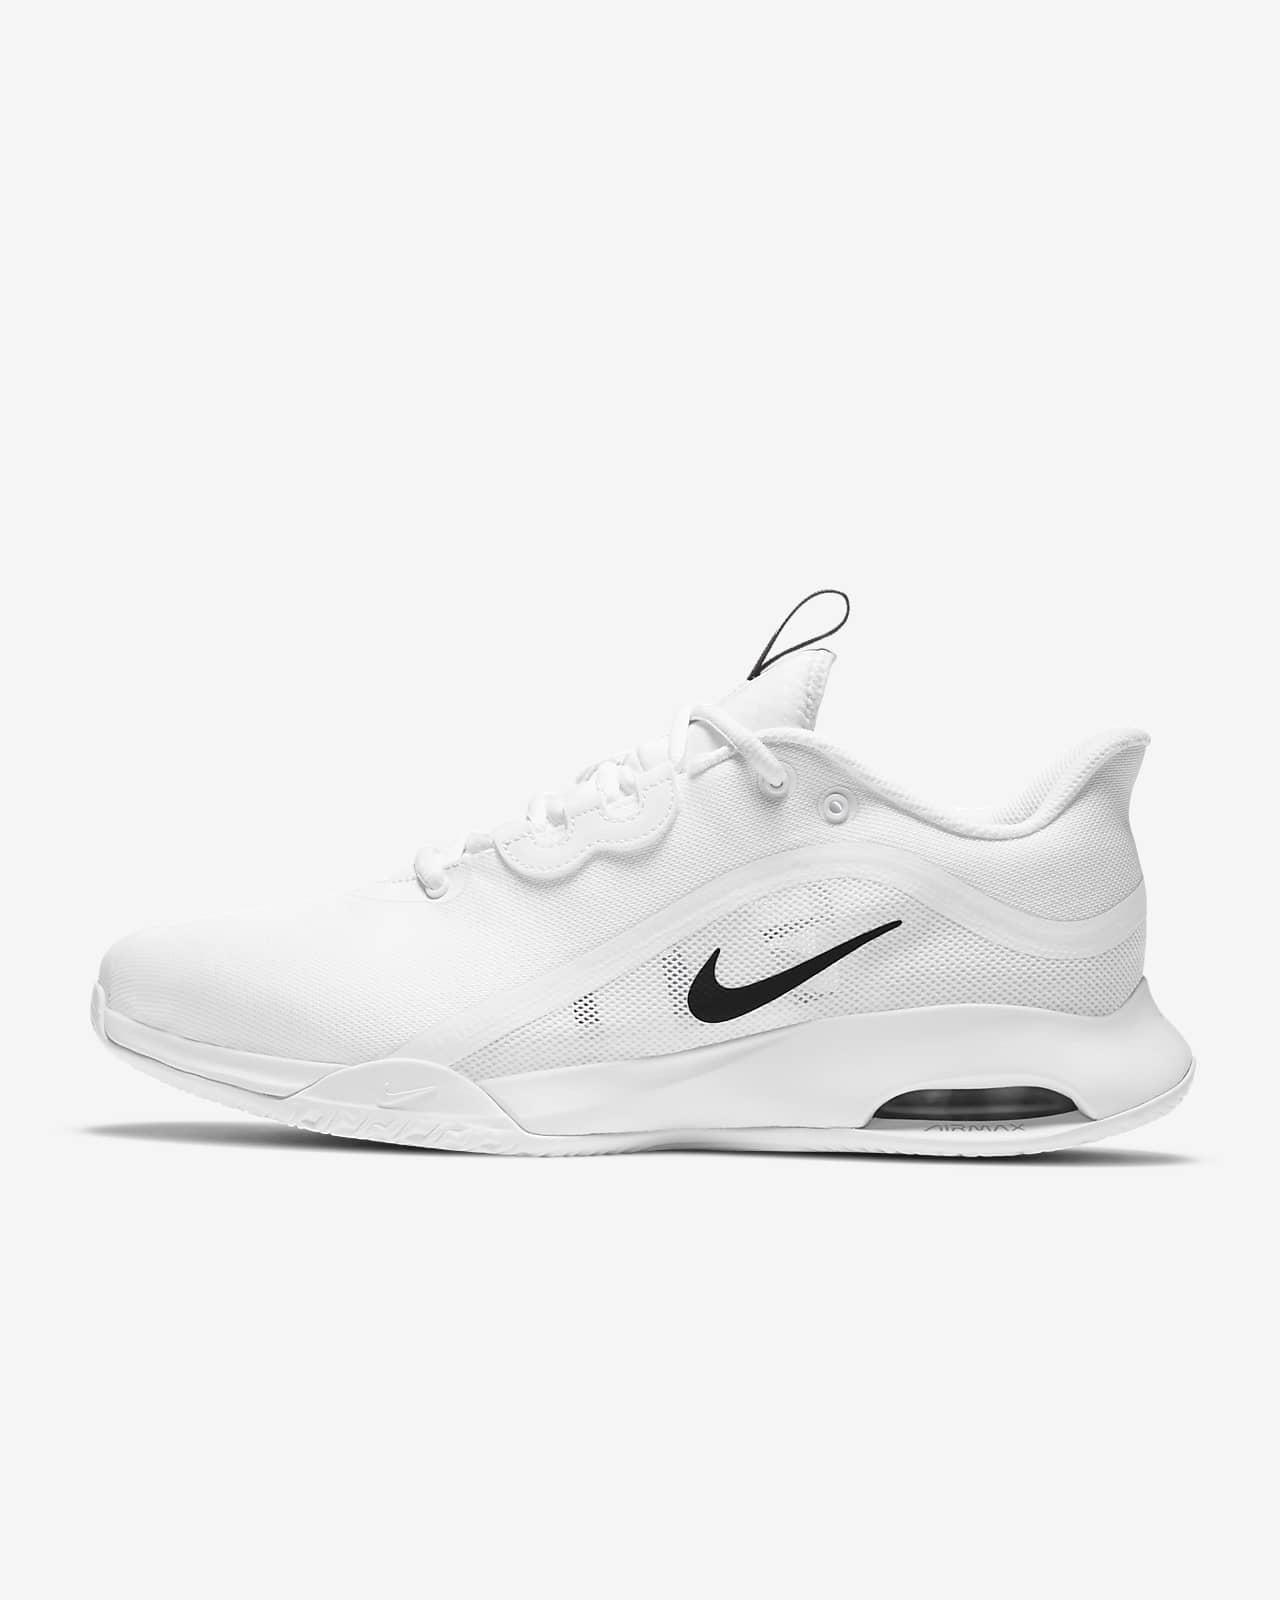 Hard Court Tennis Shoe. Nike AE